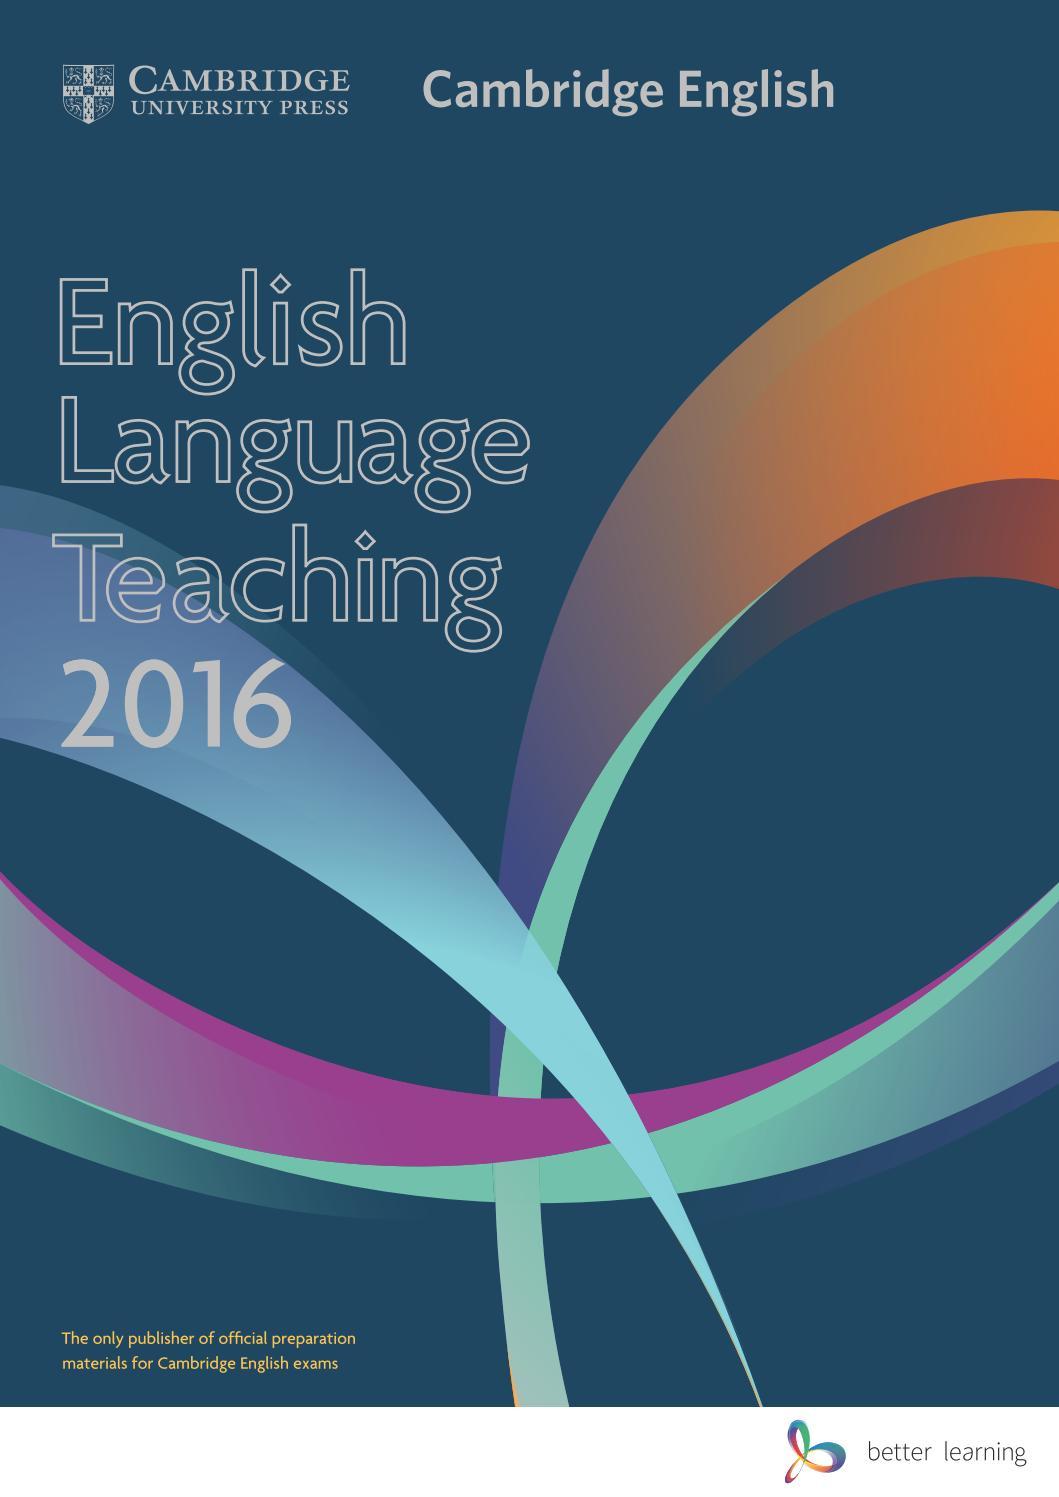 Workbooks tprh verbal workbook : Cambridge university press 2016 by Kostas Nitaf - issuu